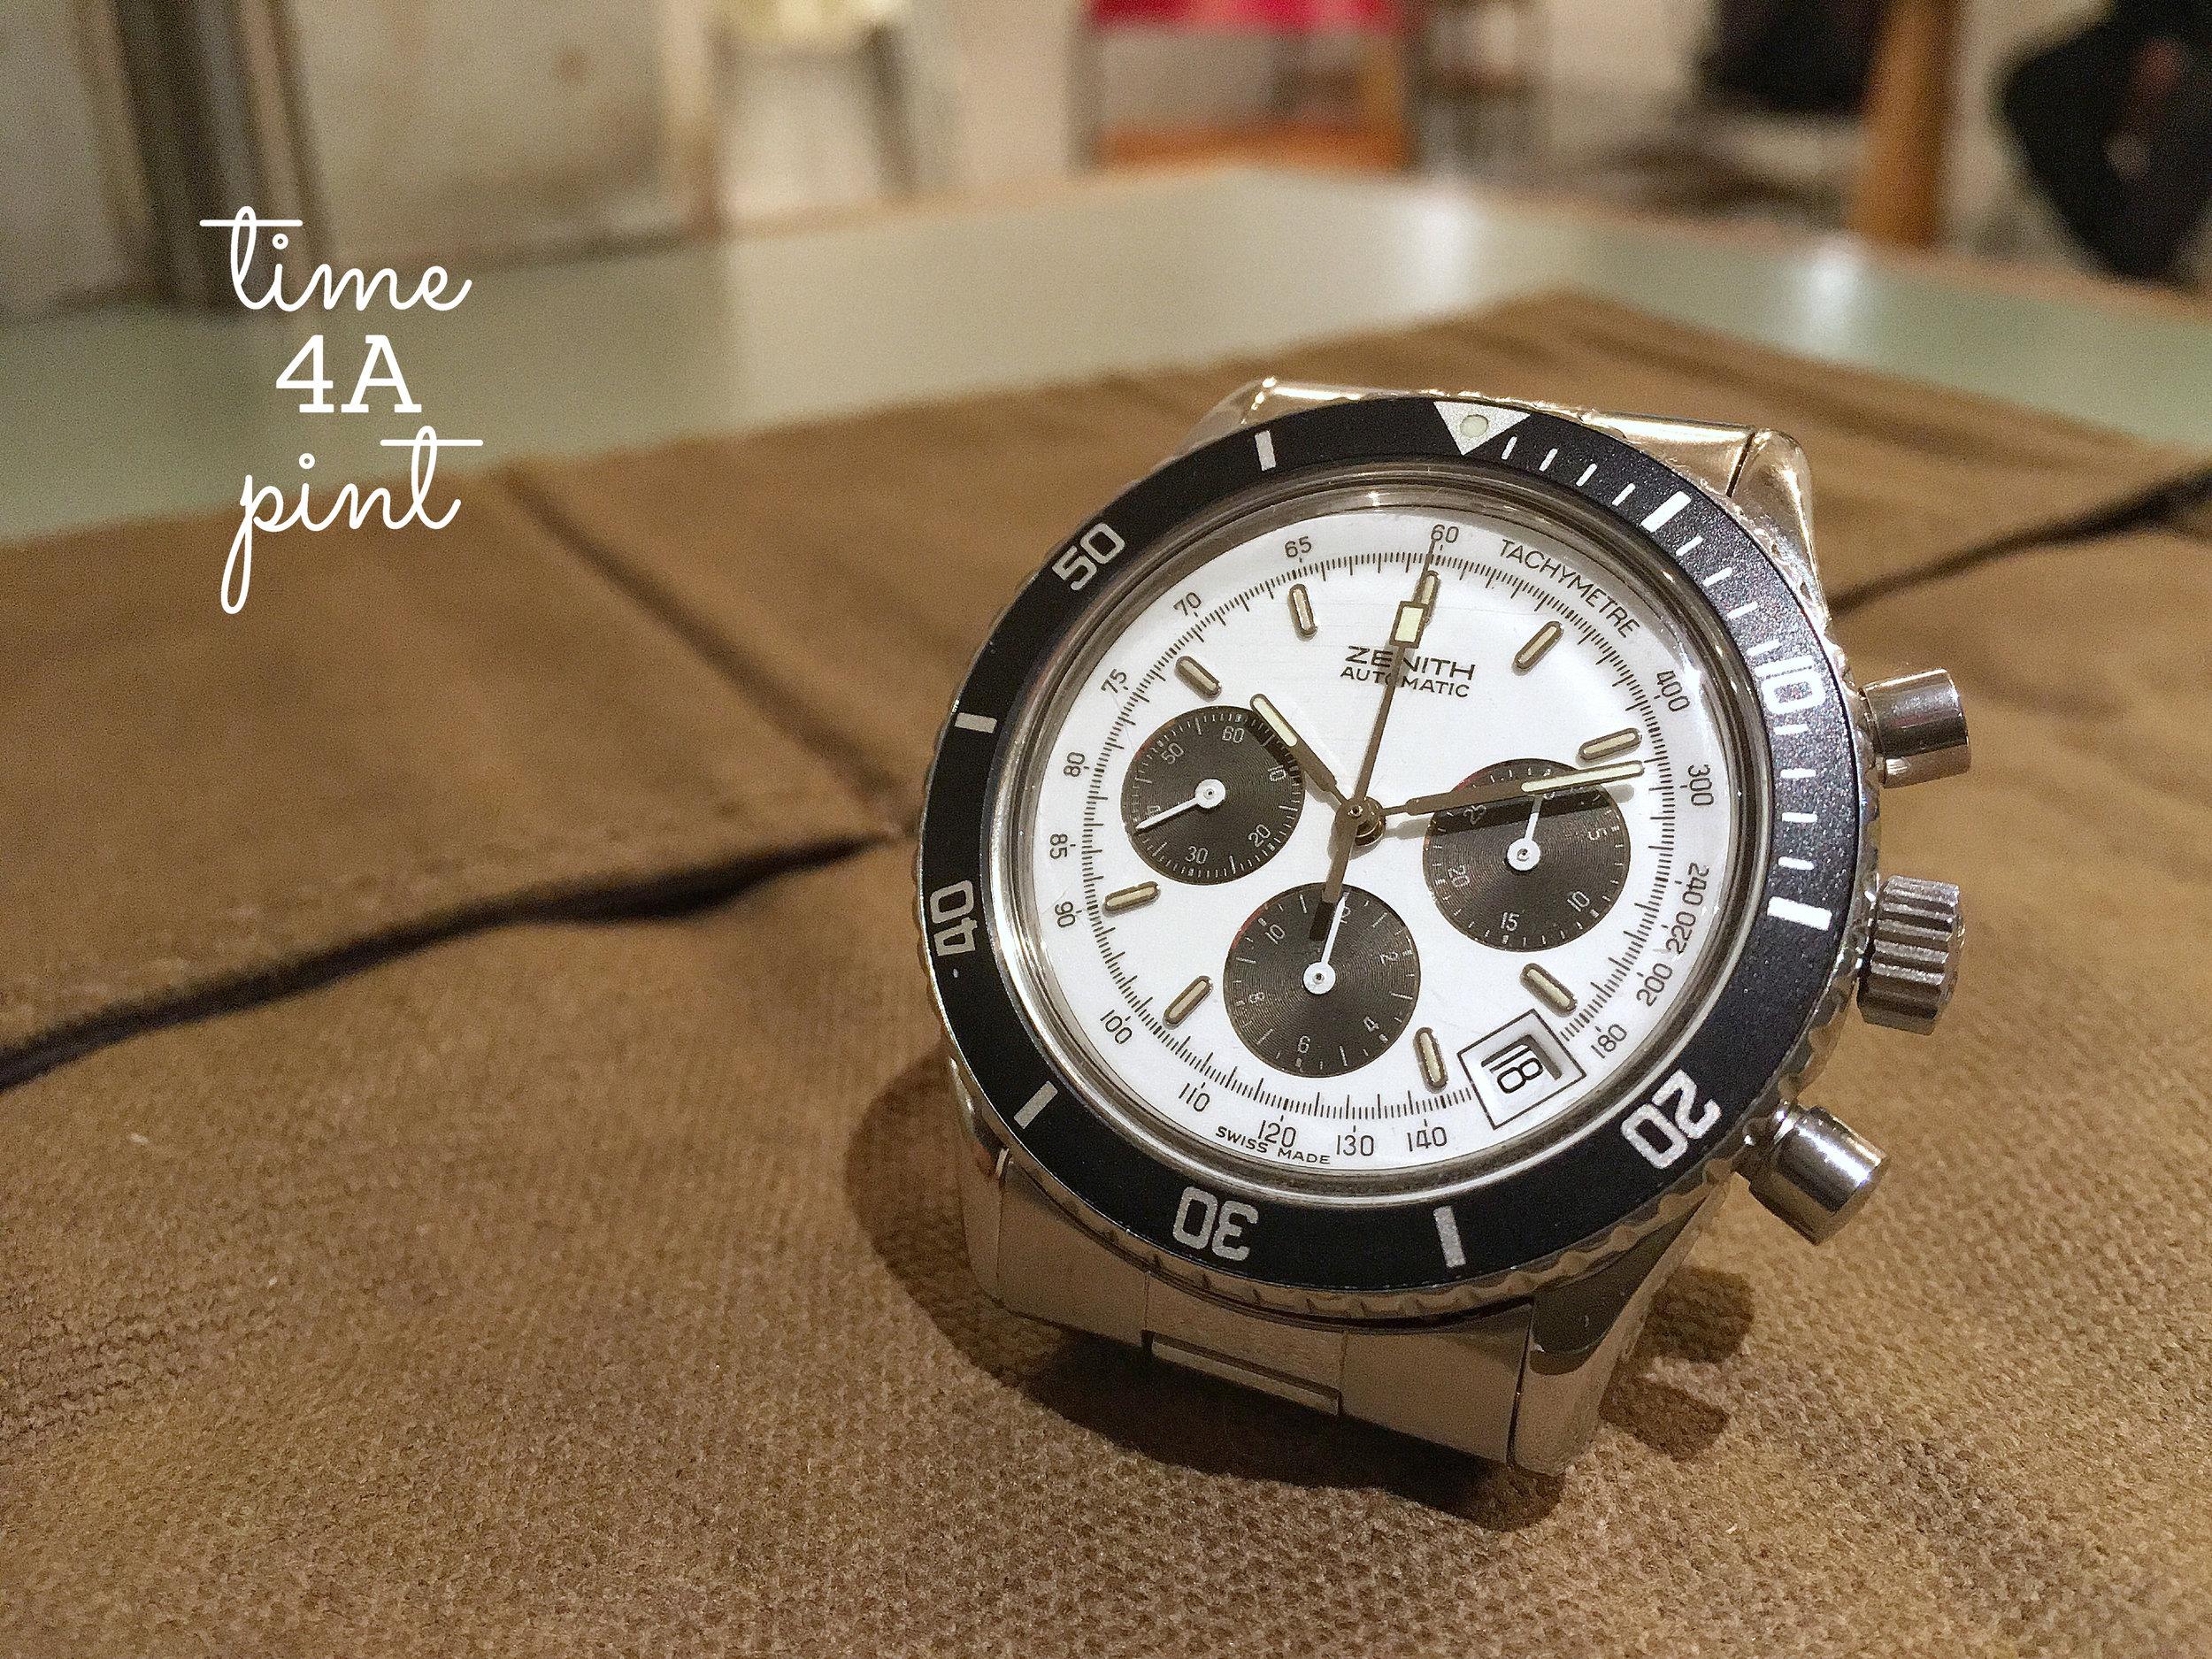 Zenith Automatic Chronograph (Series 1 De Luca)